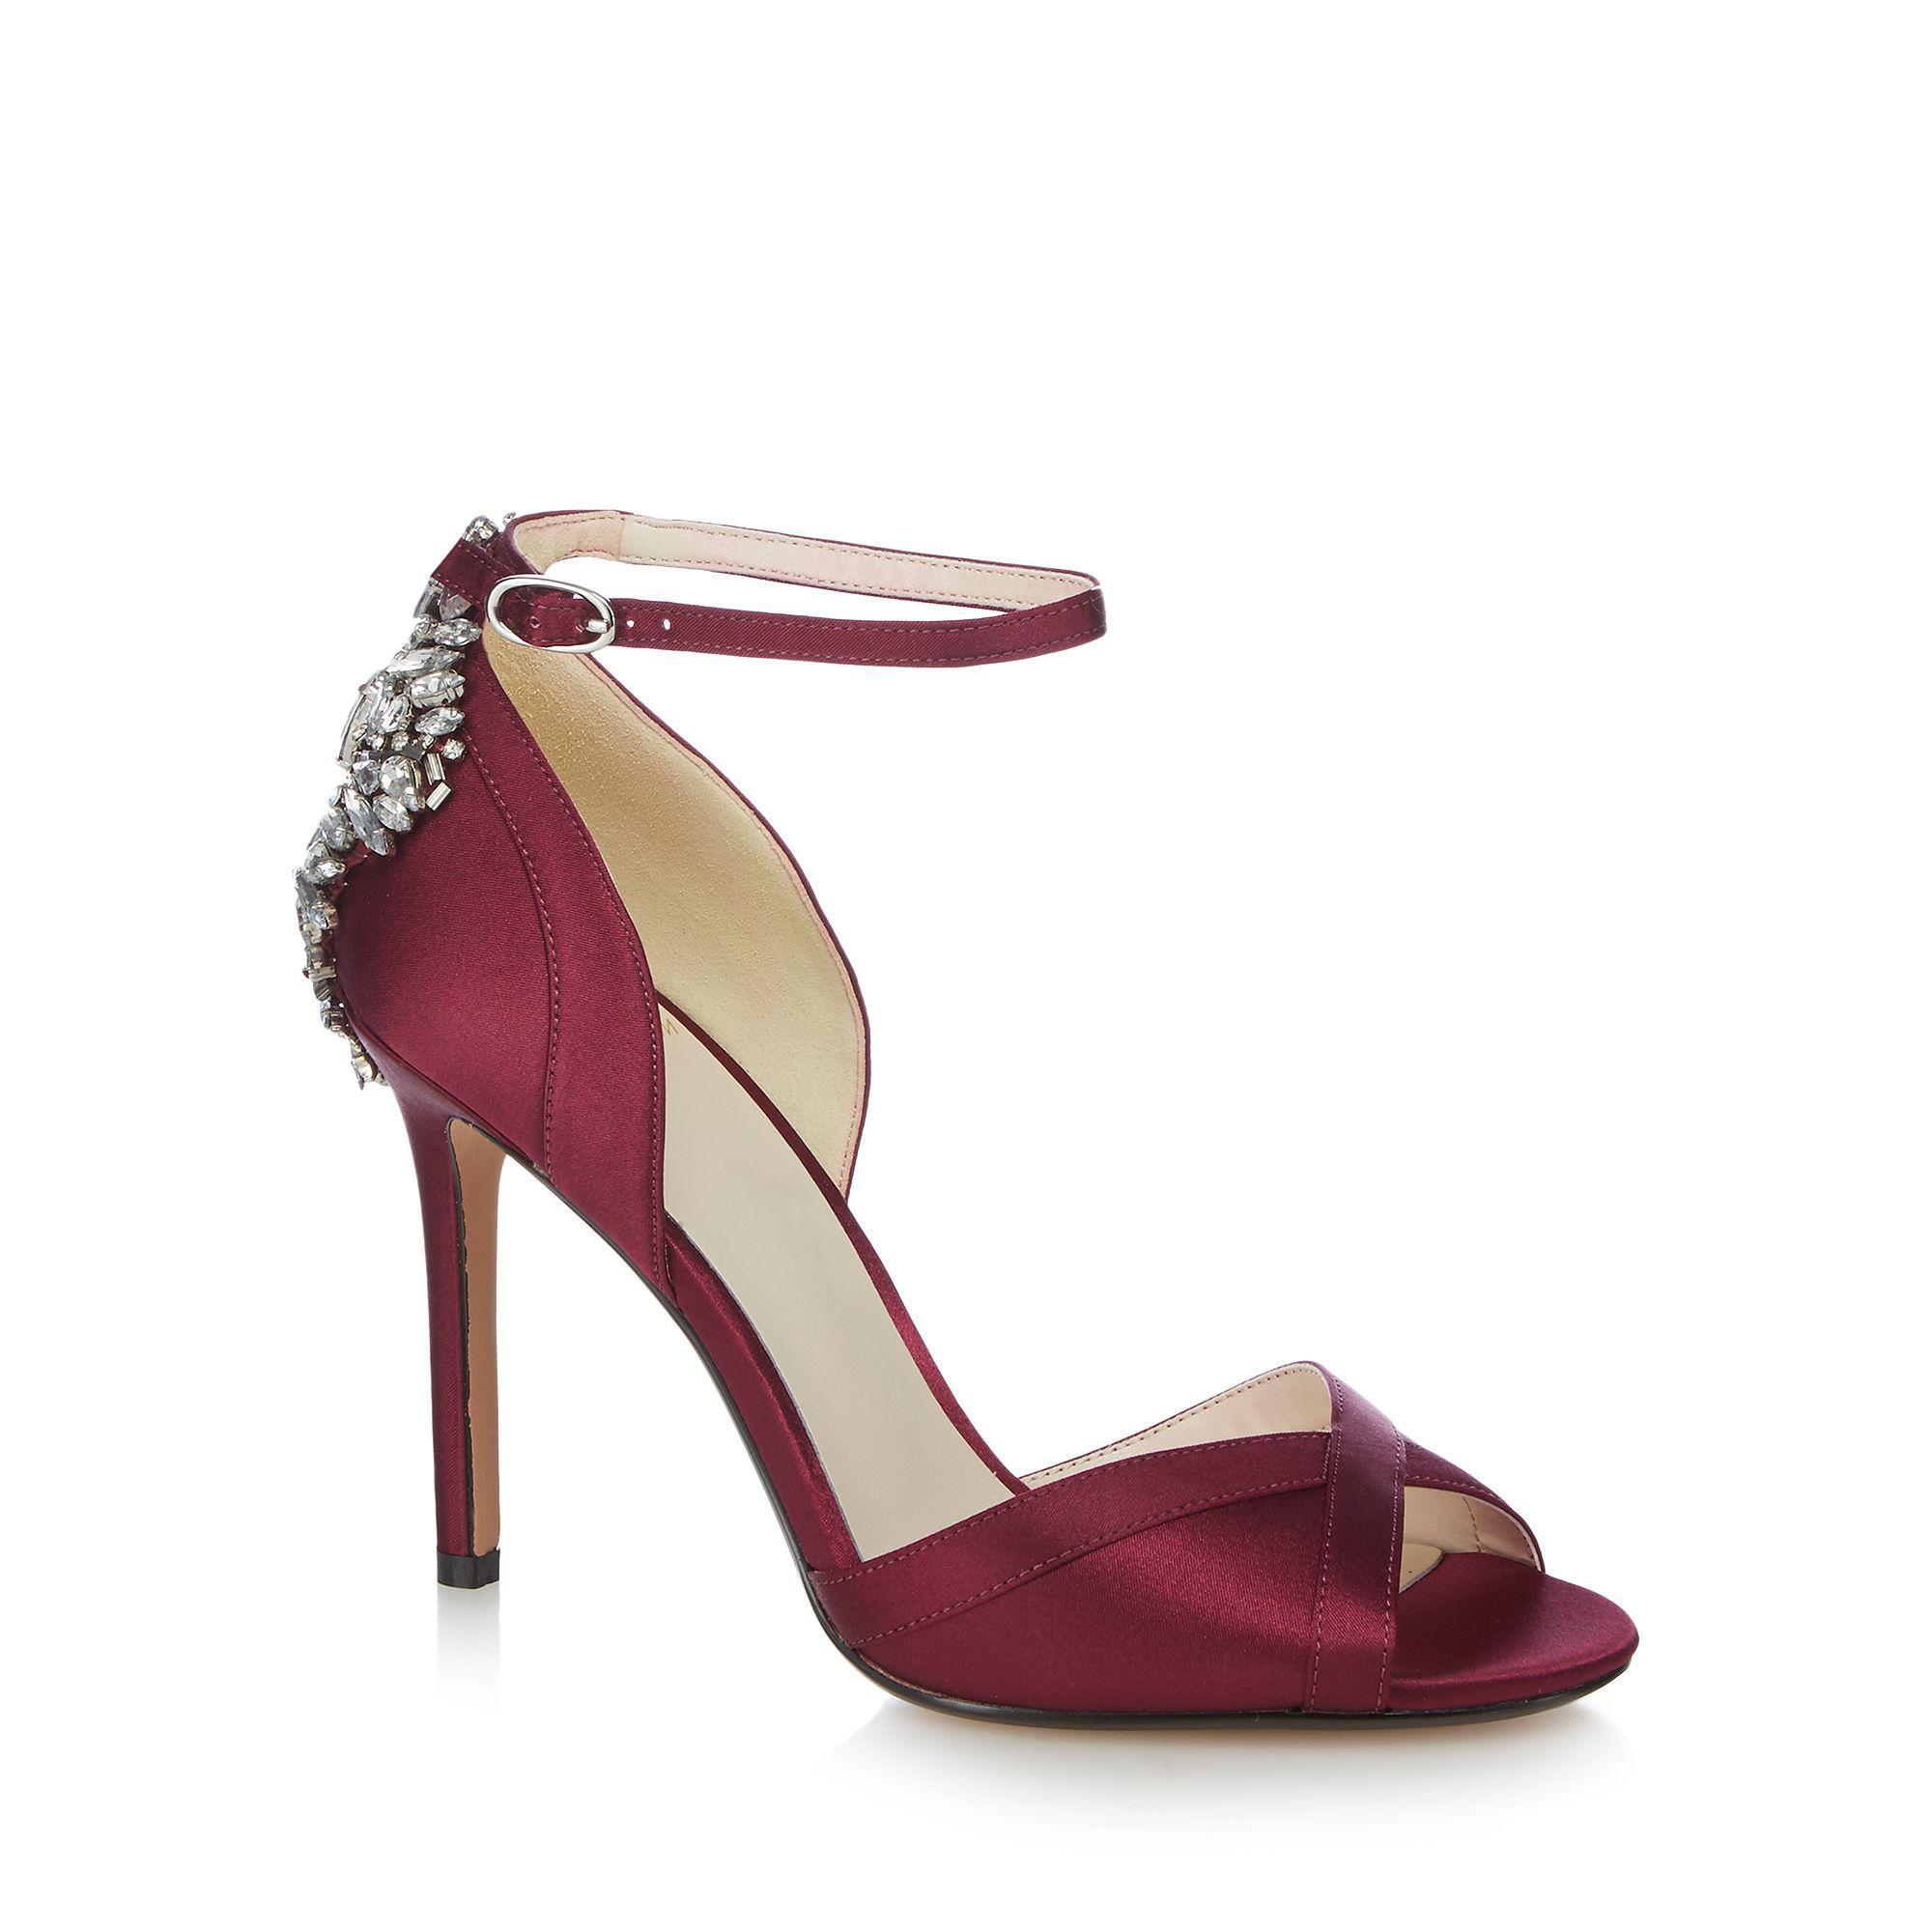 4c3c518cadc Jenny Packham Burgundy  picnic  High Stiletto Heel Ankle Strap ...